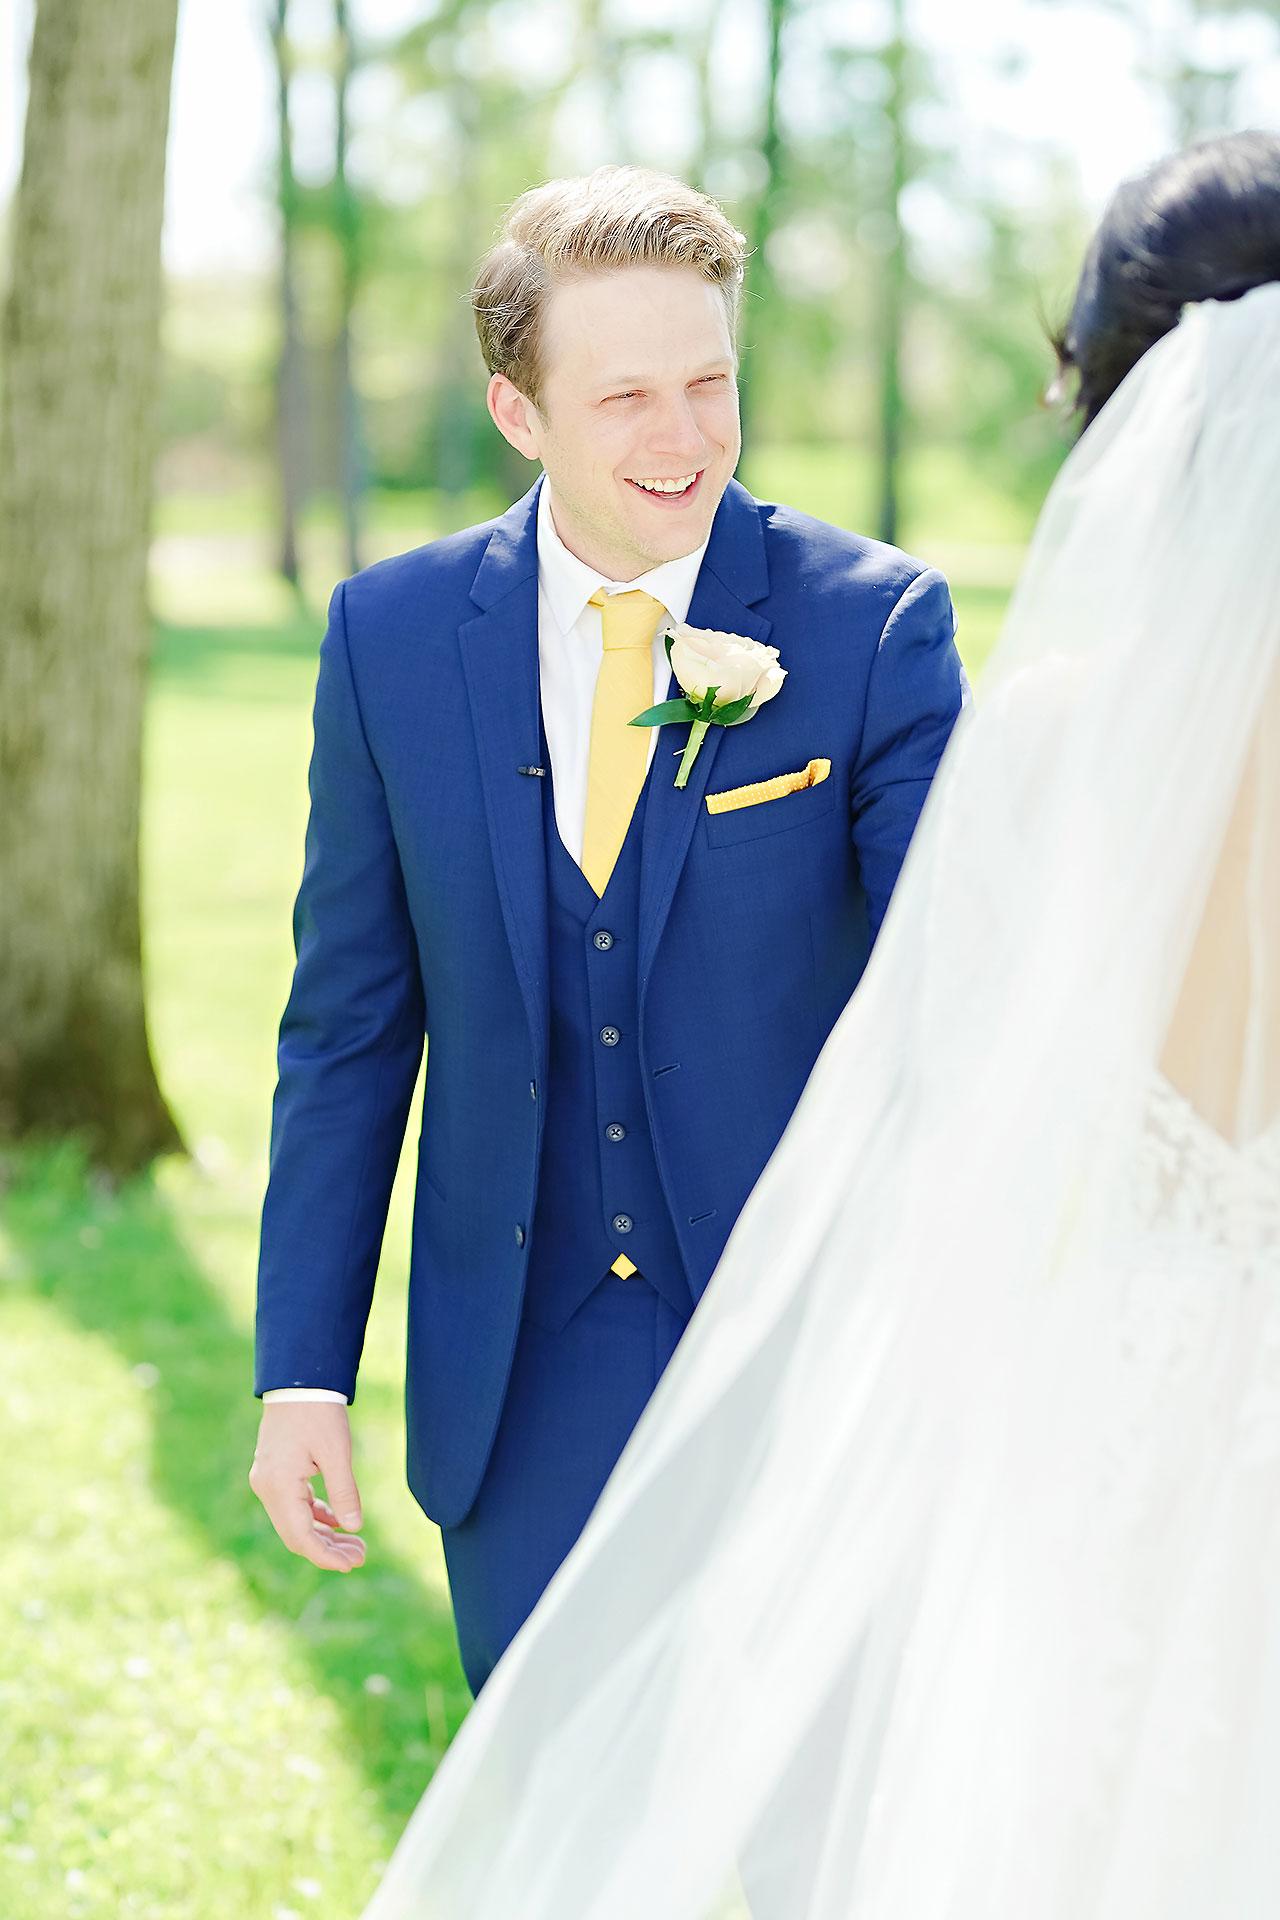 Nadia Parker Black Iris Estate Carmel Indiana Wedding May 2021 052